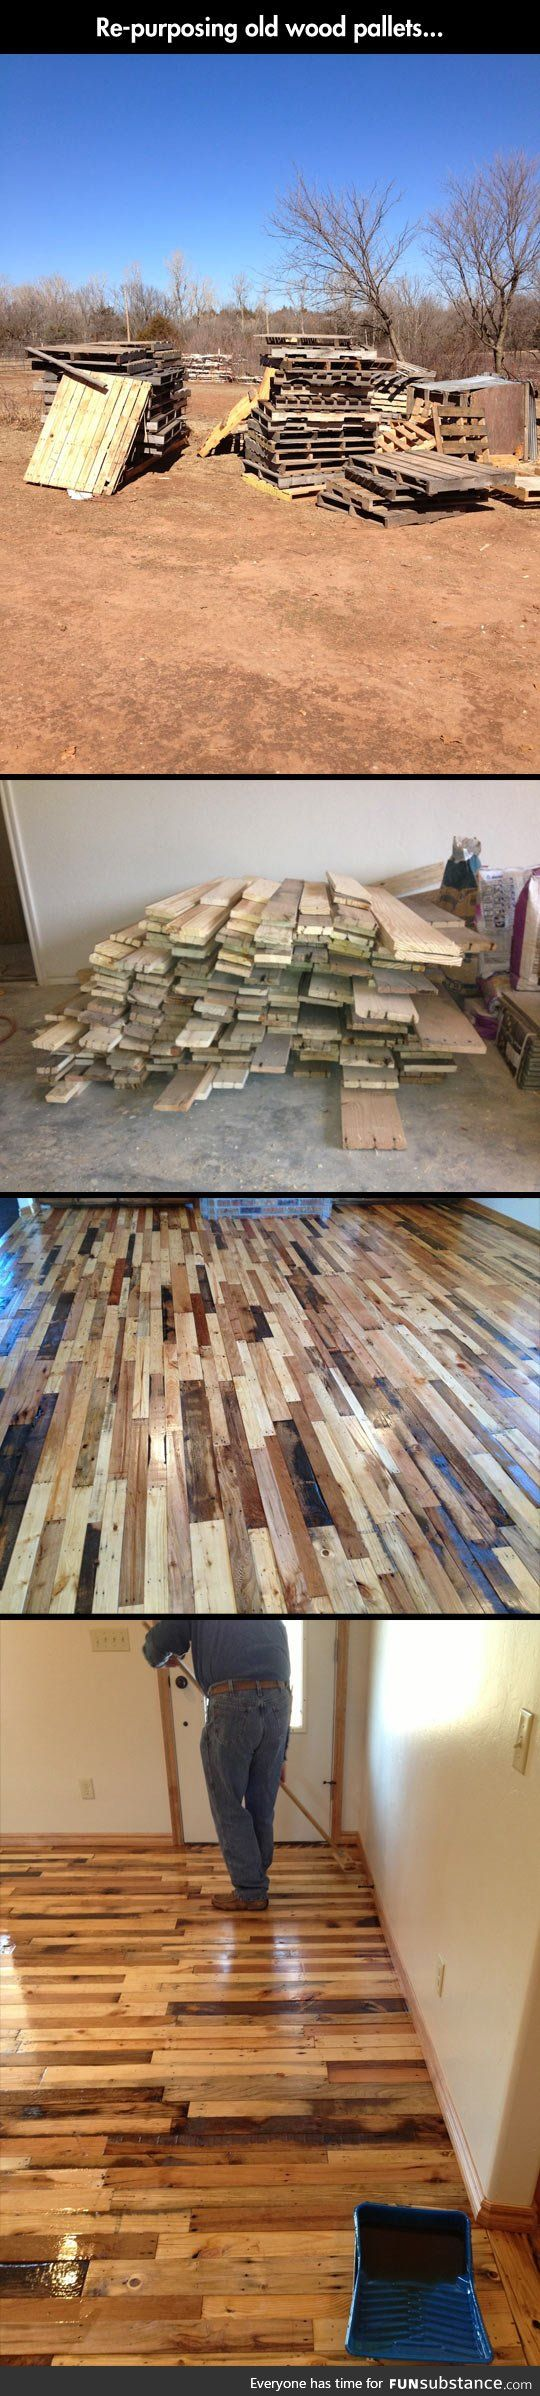 Reusing old woods pallets